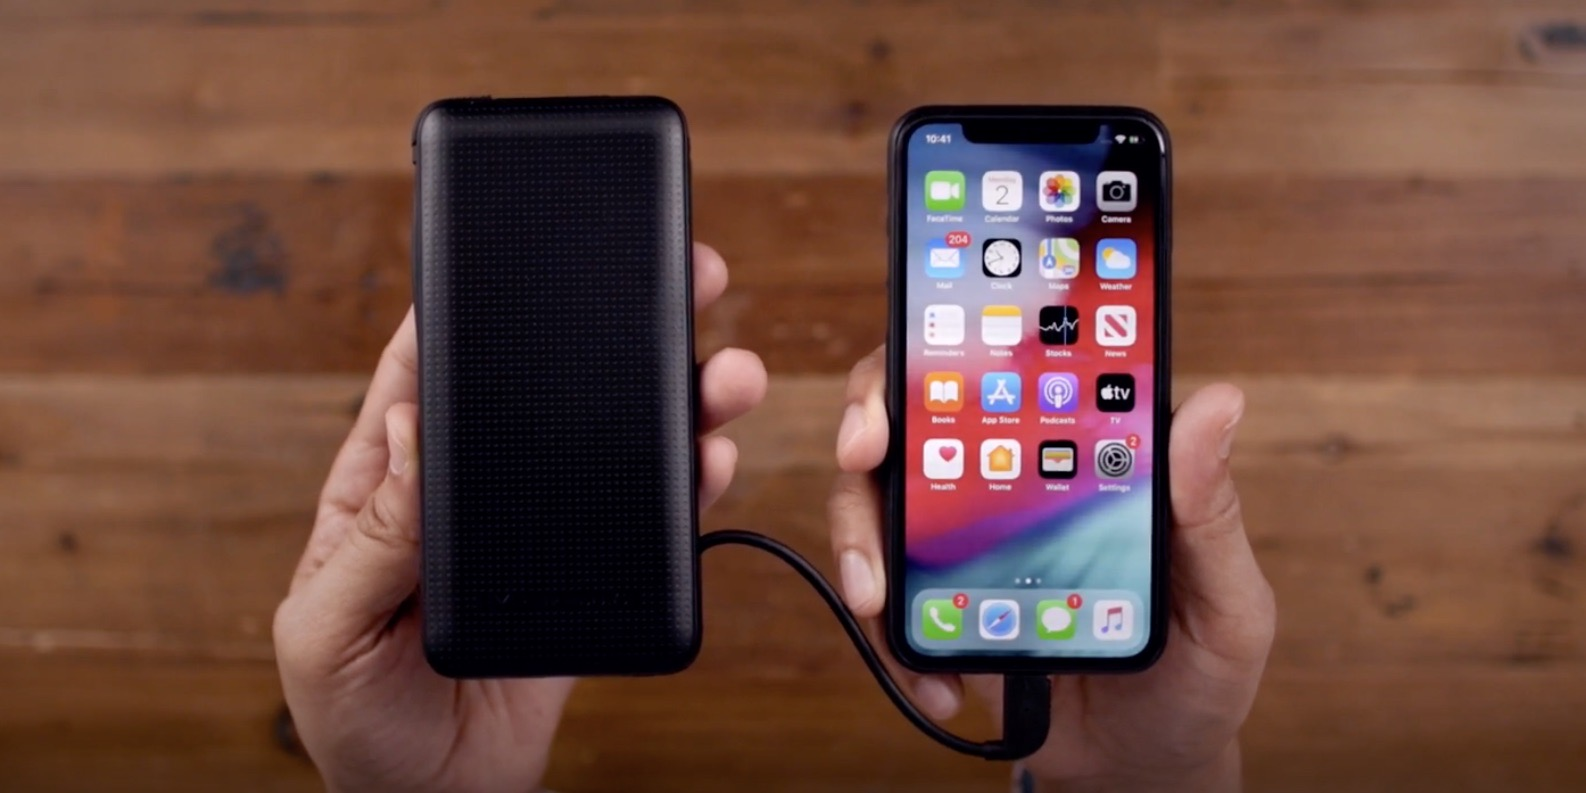 HyperJuice USB-C + Lightning Battery iPhone fast charging